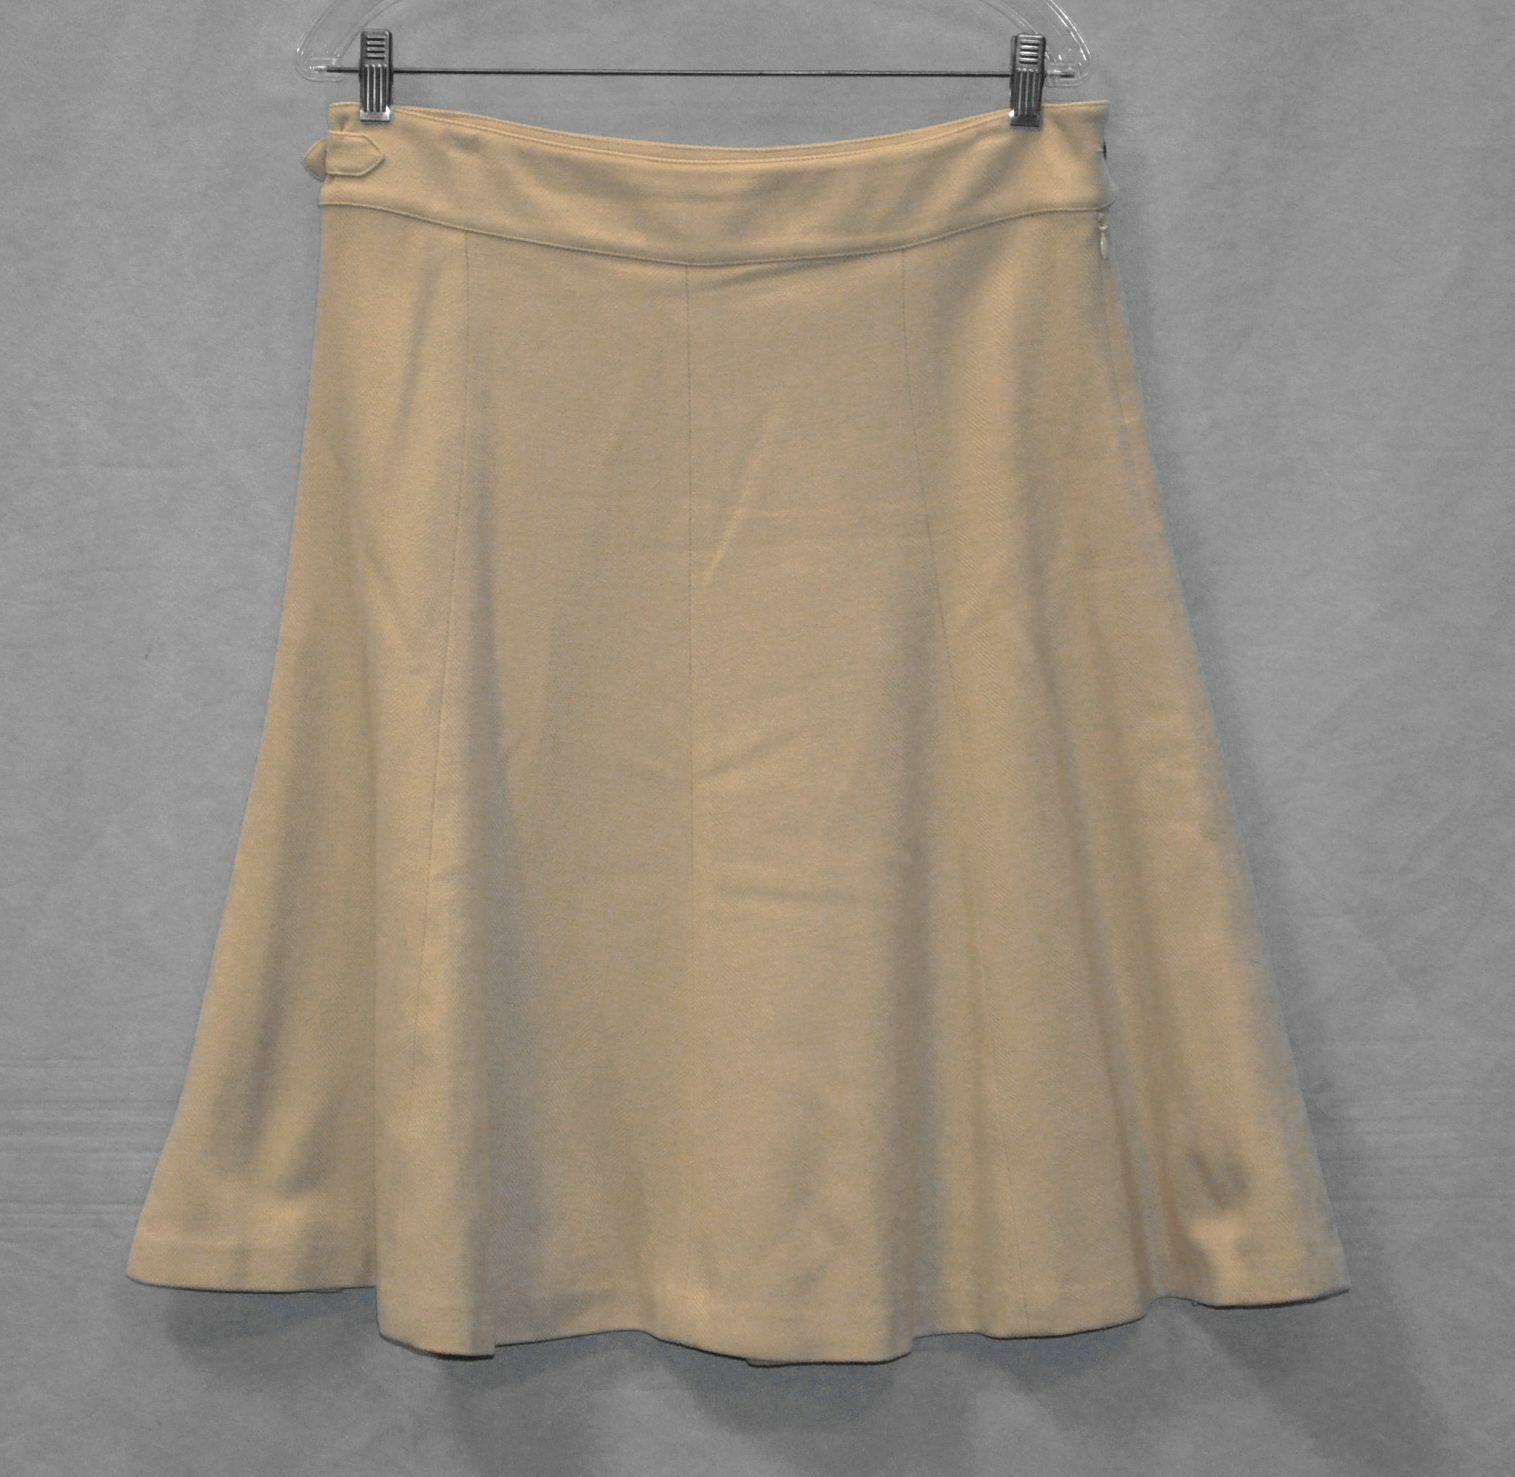 B6 NEW RALPH LAUREN Purple Label Beige Cashmere Wool Blend Flare Skirt Size 10